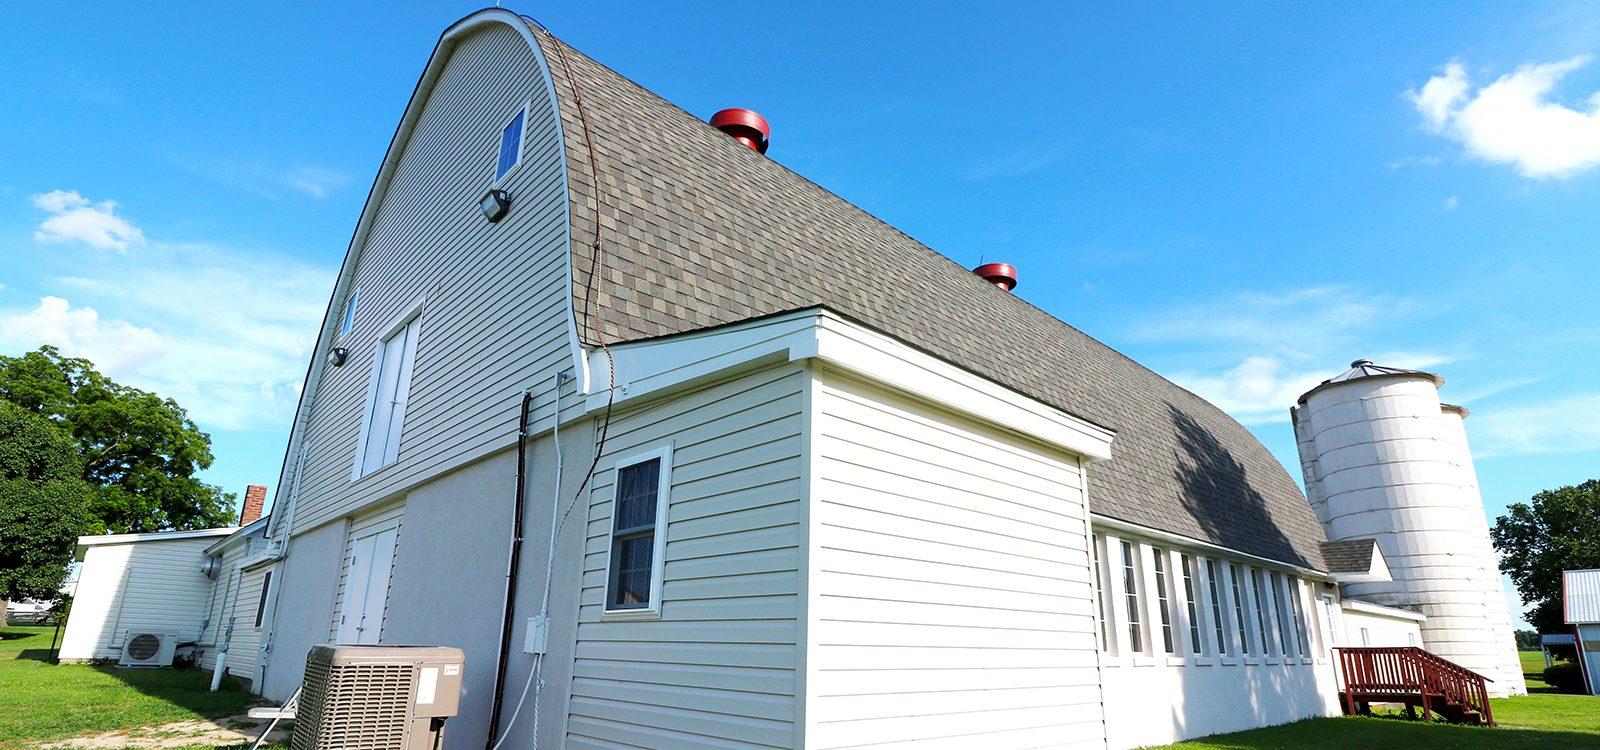 hazelwild-farm-roof-repair-2.jpg